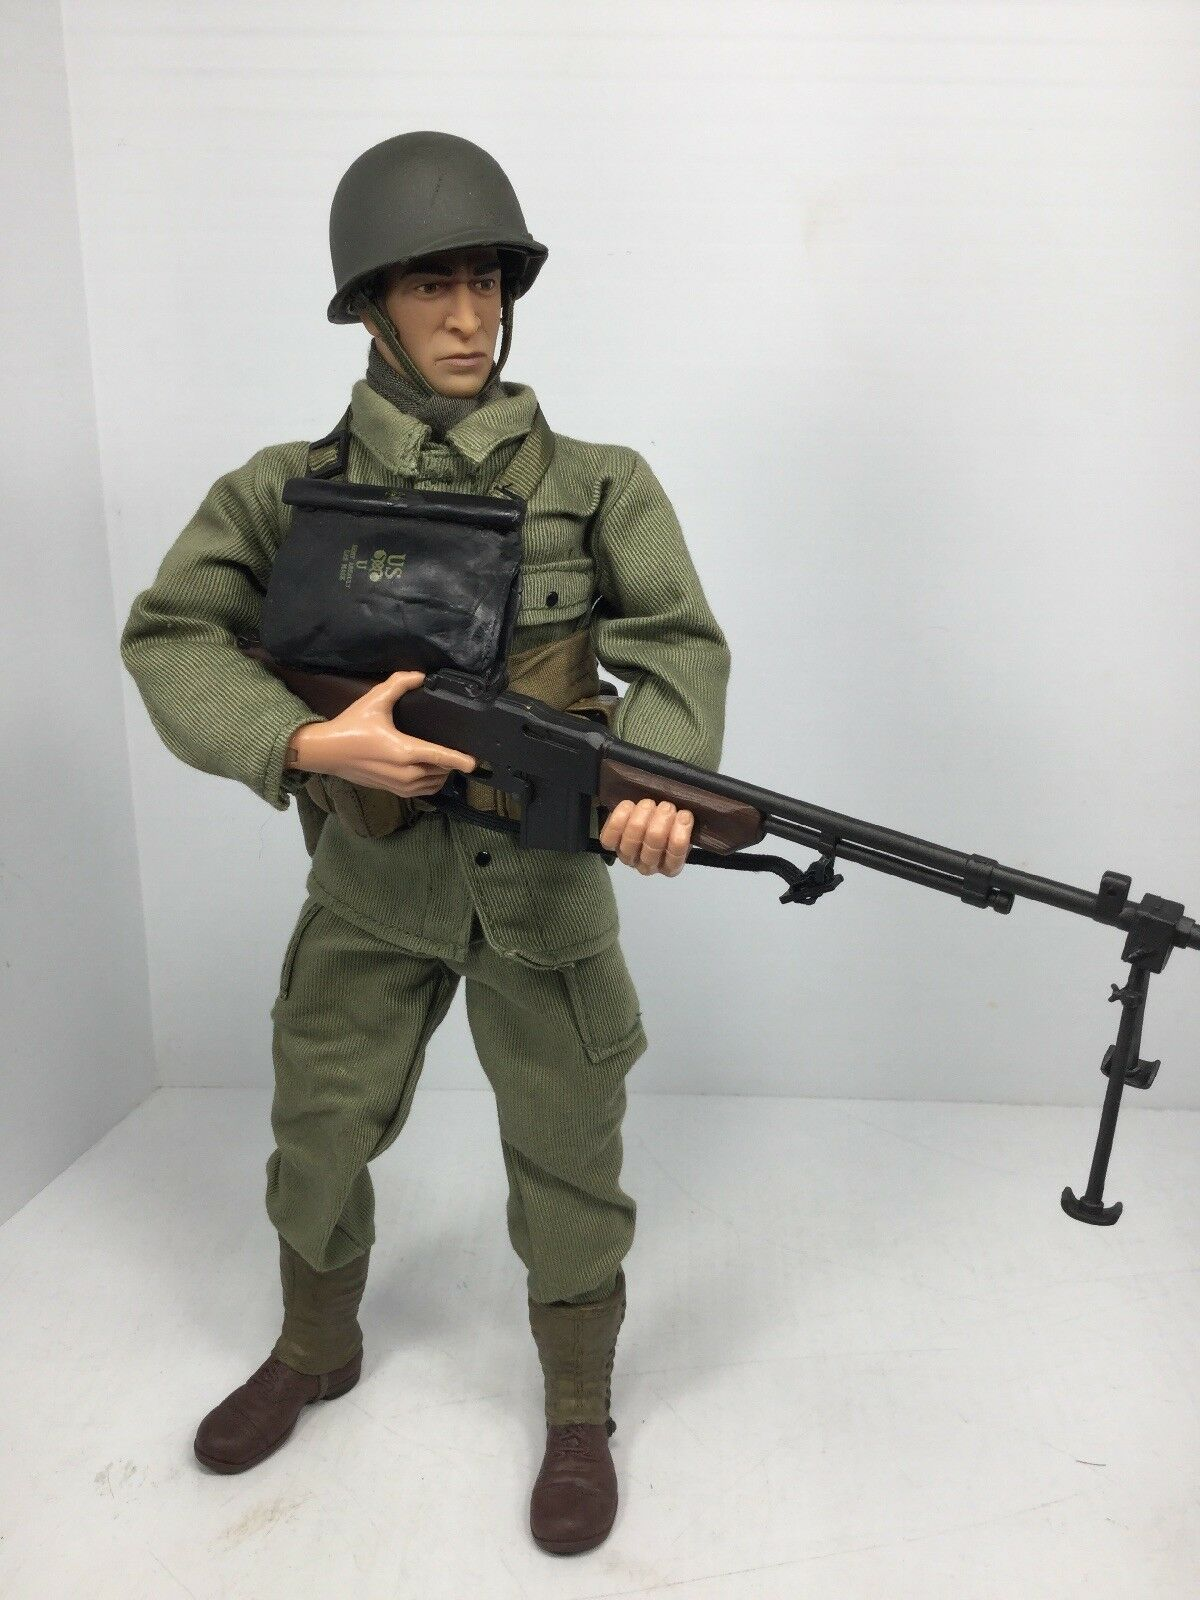 16 21ST CENTURY US 29TH INF DIV BAR GUNNER  FULLY LOADED  WW2 DRAGON BBI DID